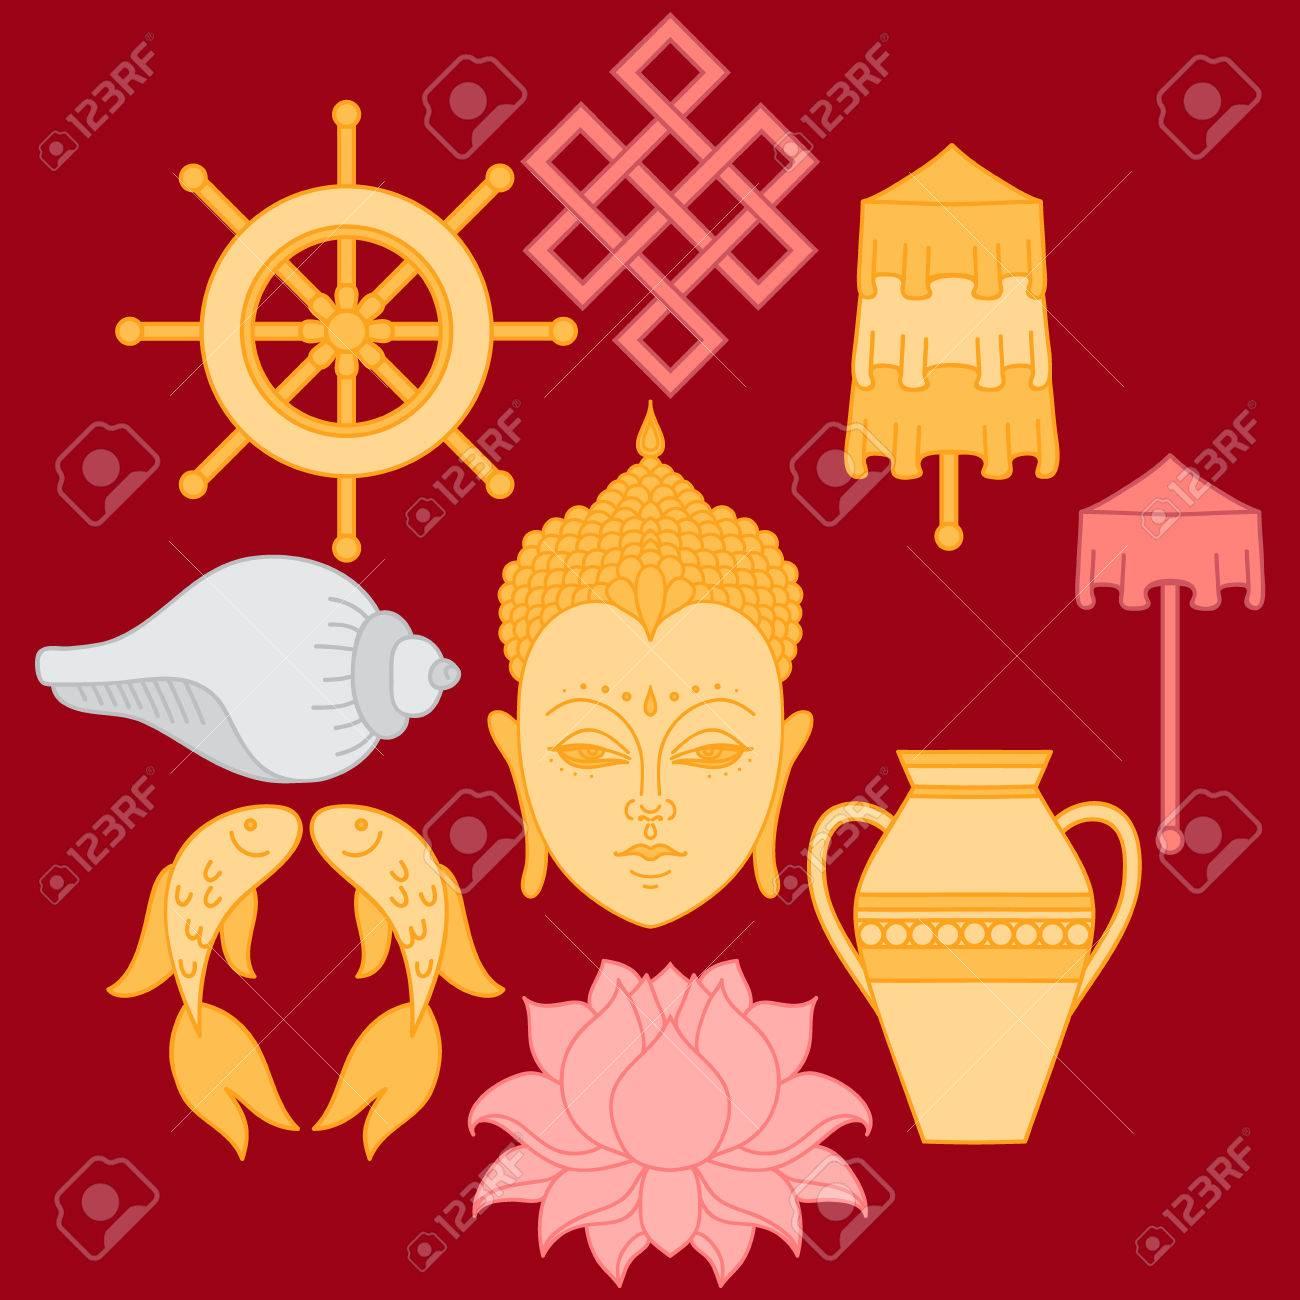 Buddhist symbolism the 8 auspicious symbols of buddhism right buddhist symbolism the 8 auspicious symbols of buddhism right coiled white conch biocorpaavc Choice Image